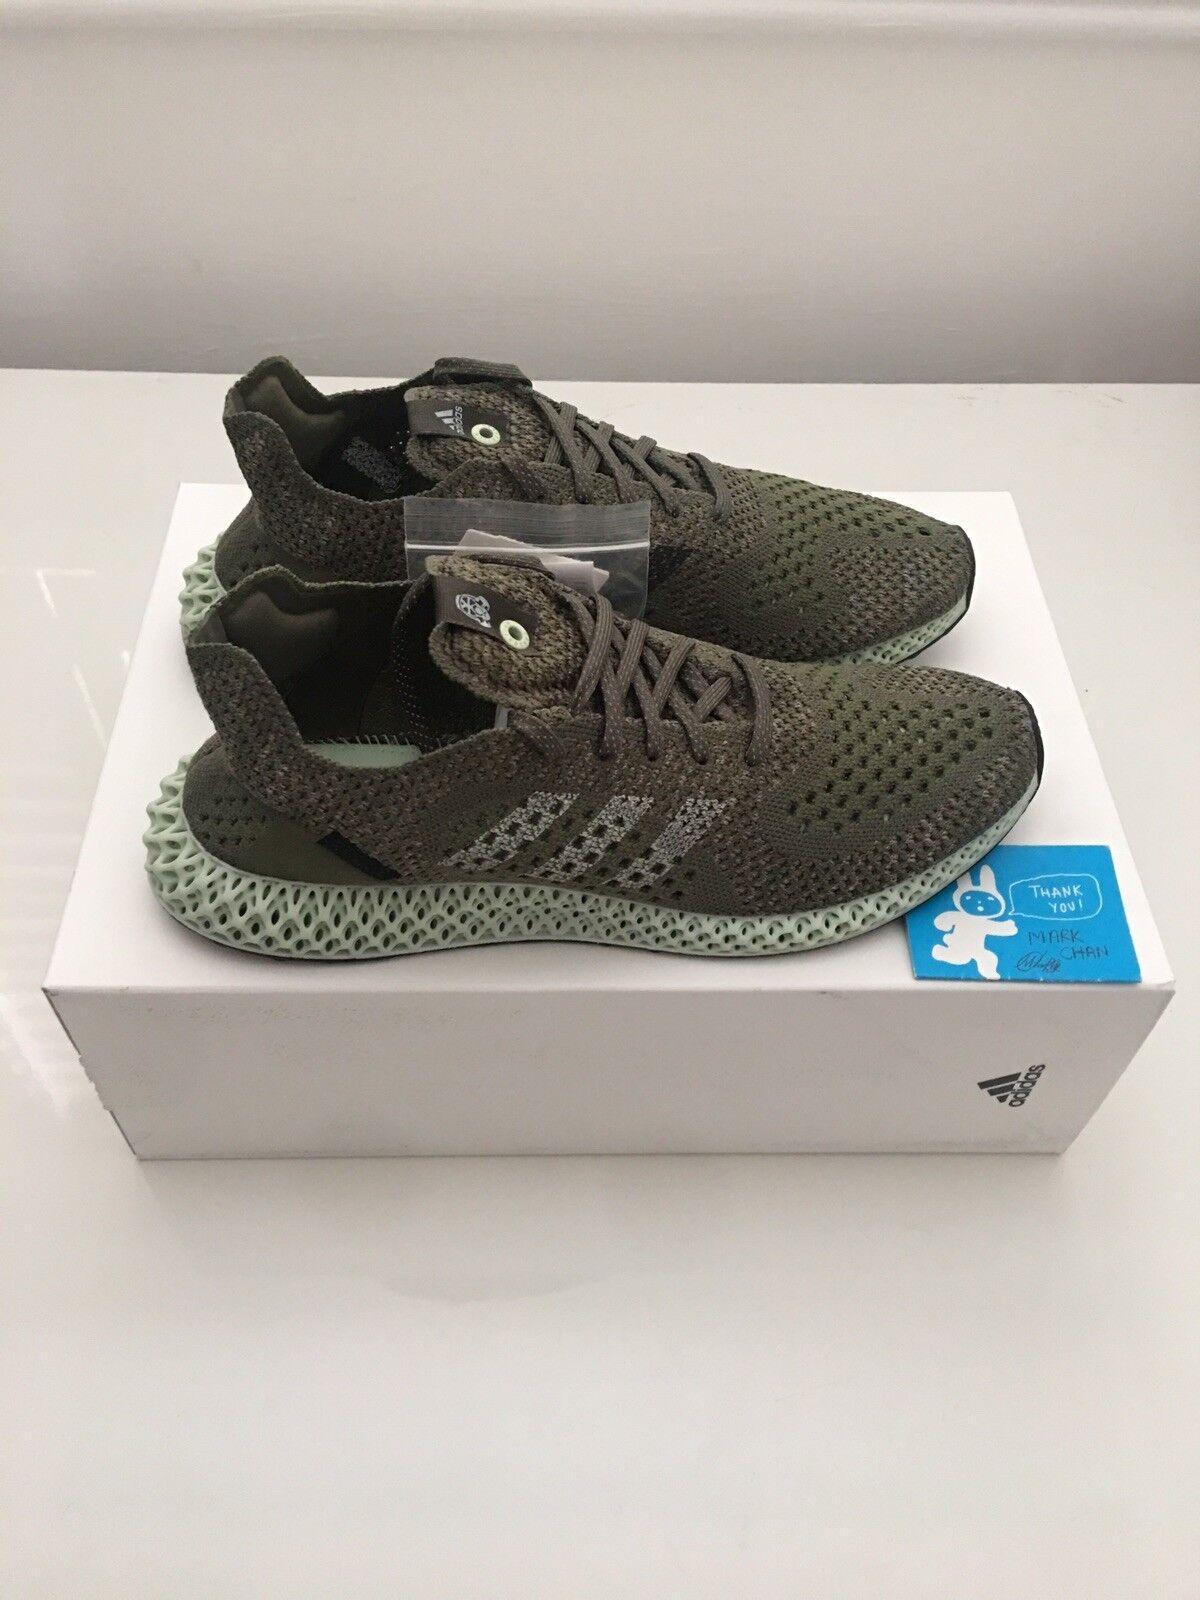 Adidas Consortium Runner 4D x Footpatrol UK9.5 (US10) Deadstock